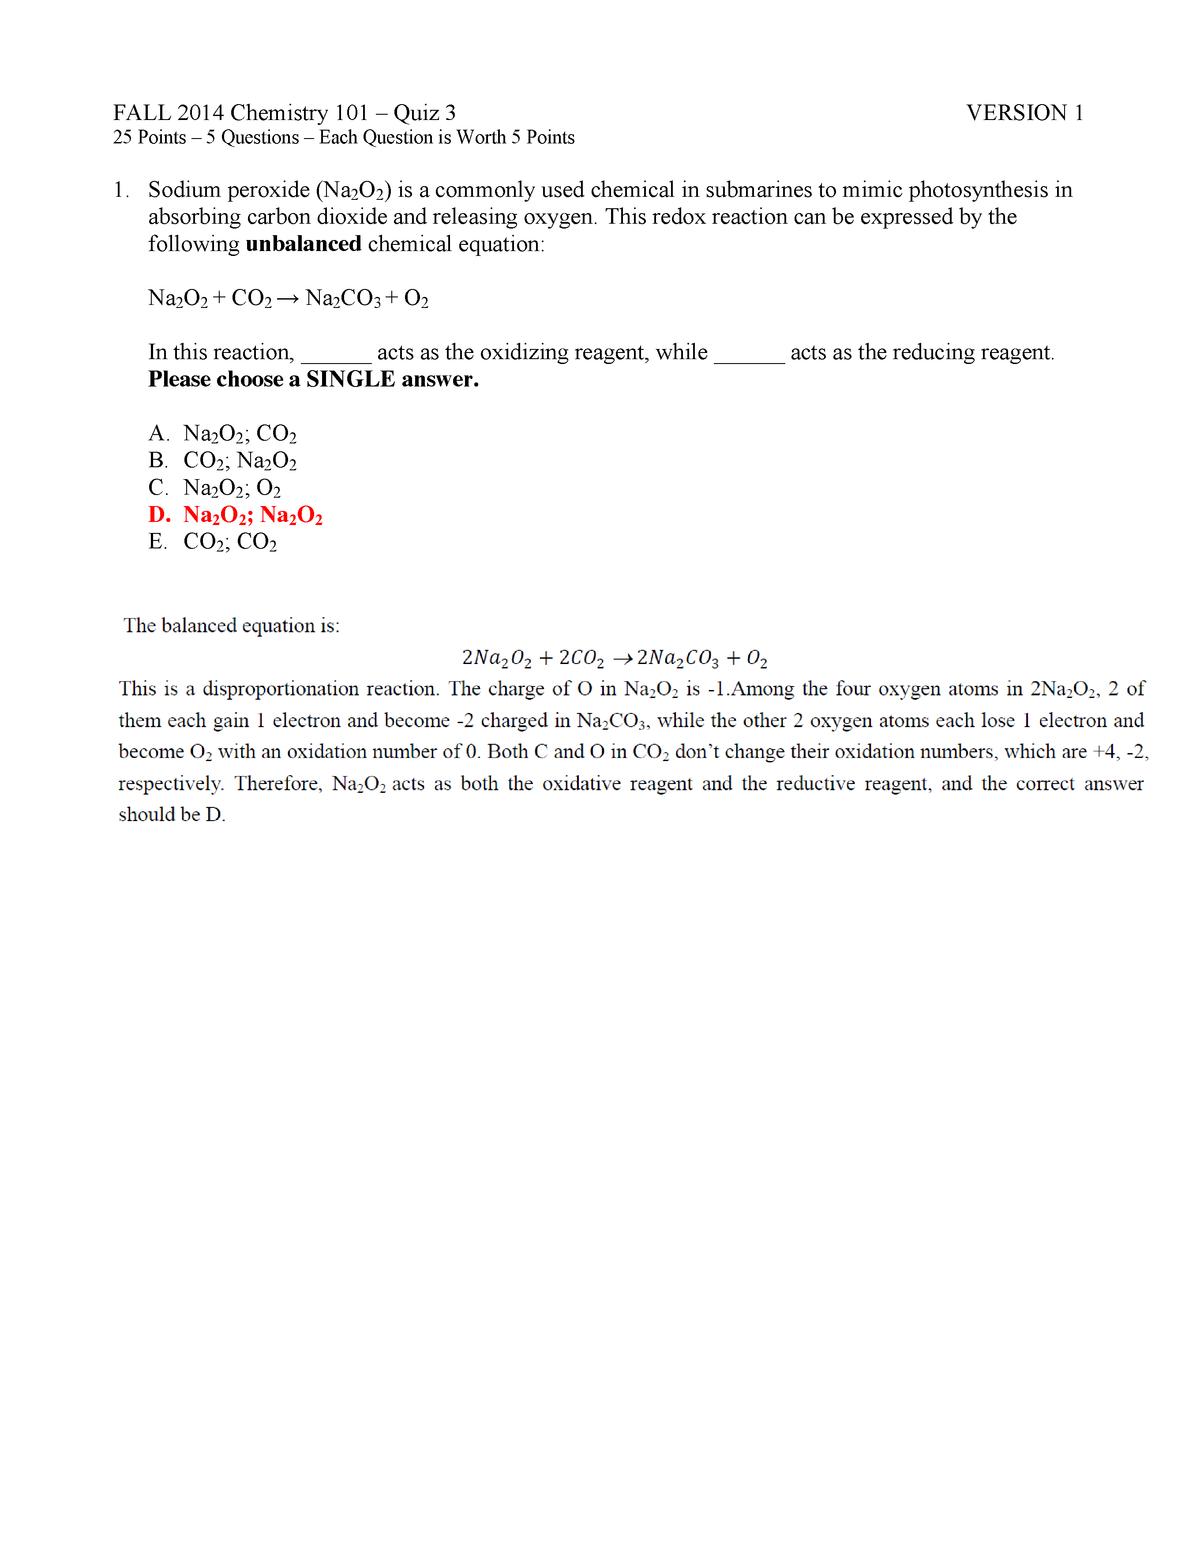 Quiz 3 Key - quiz 3 answers - CHEM 101 General Chemistry ...